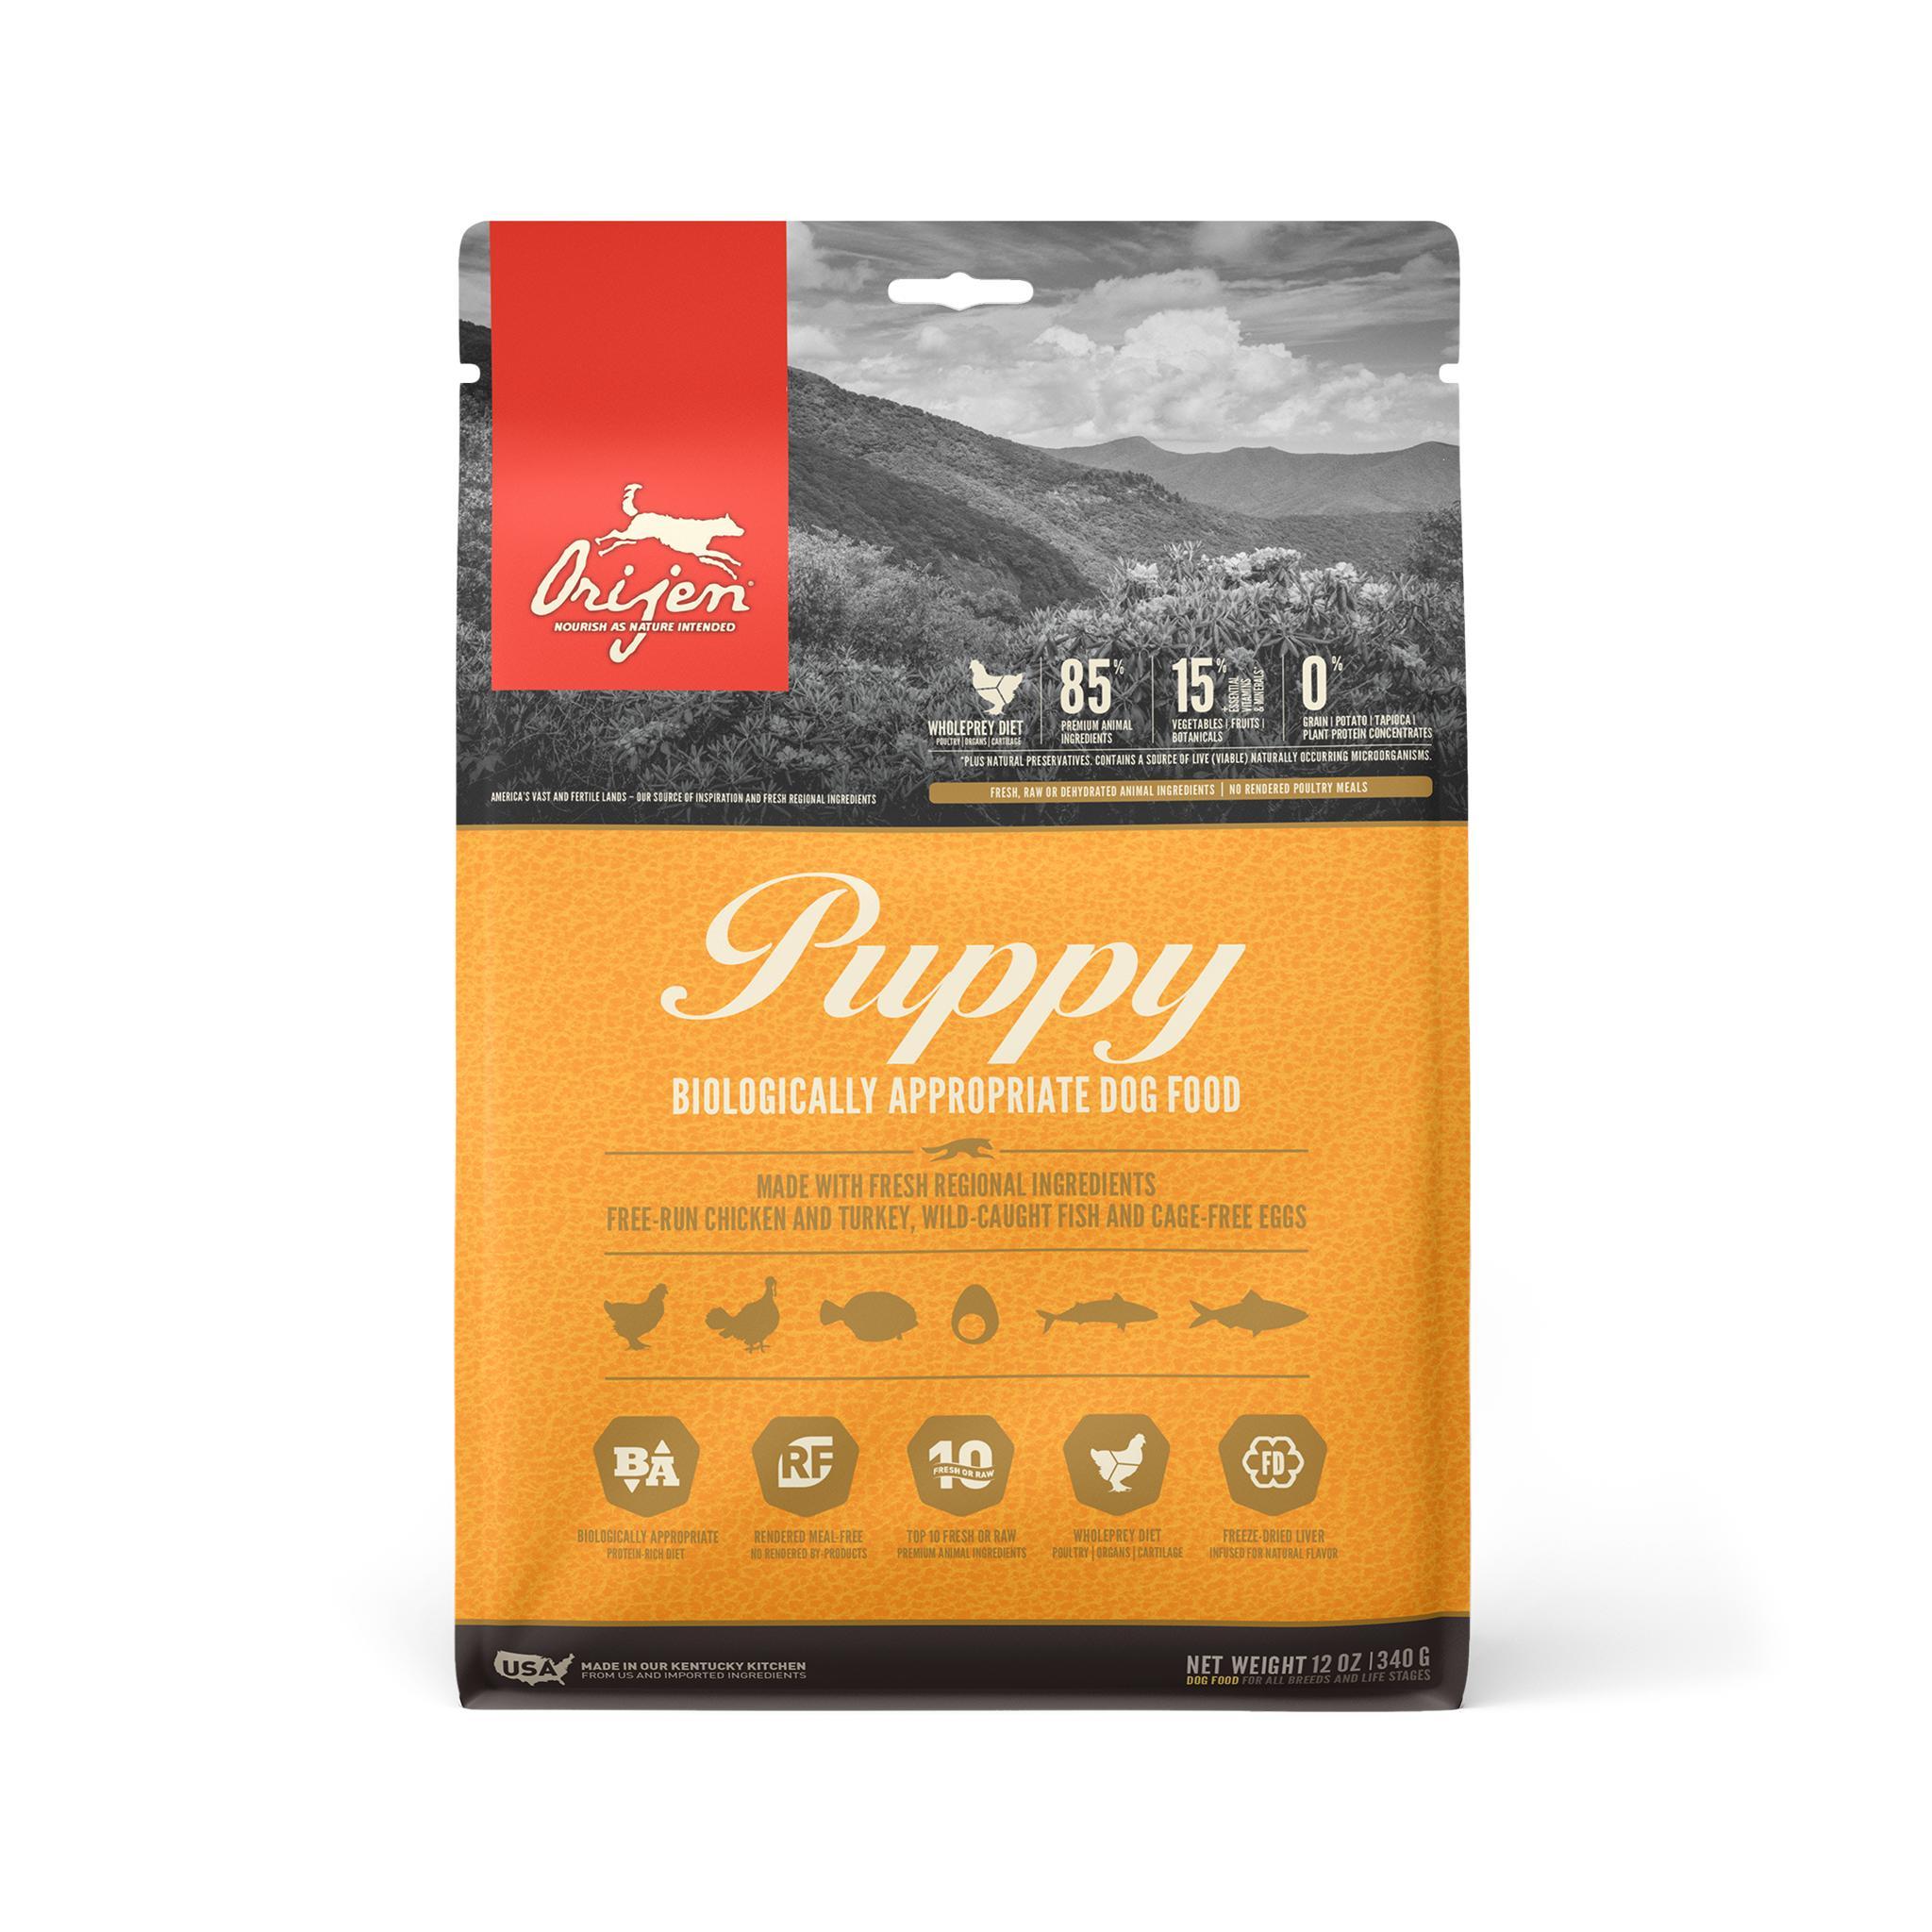 ORIJEN Puppy Grain-Free Dry Dog Food Image